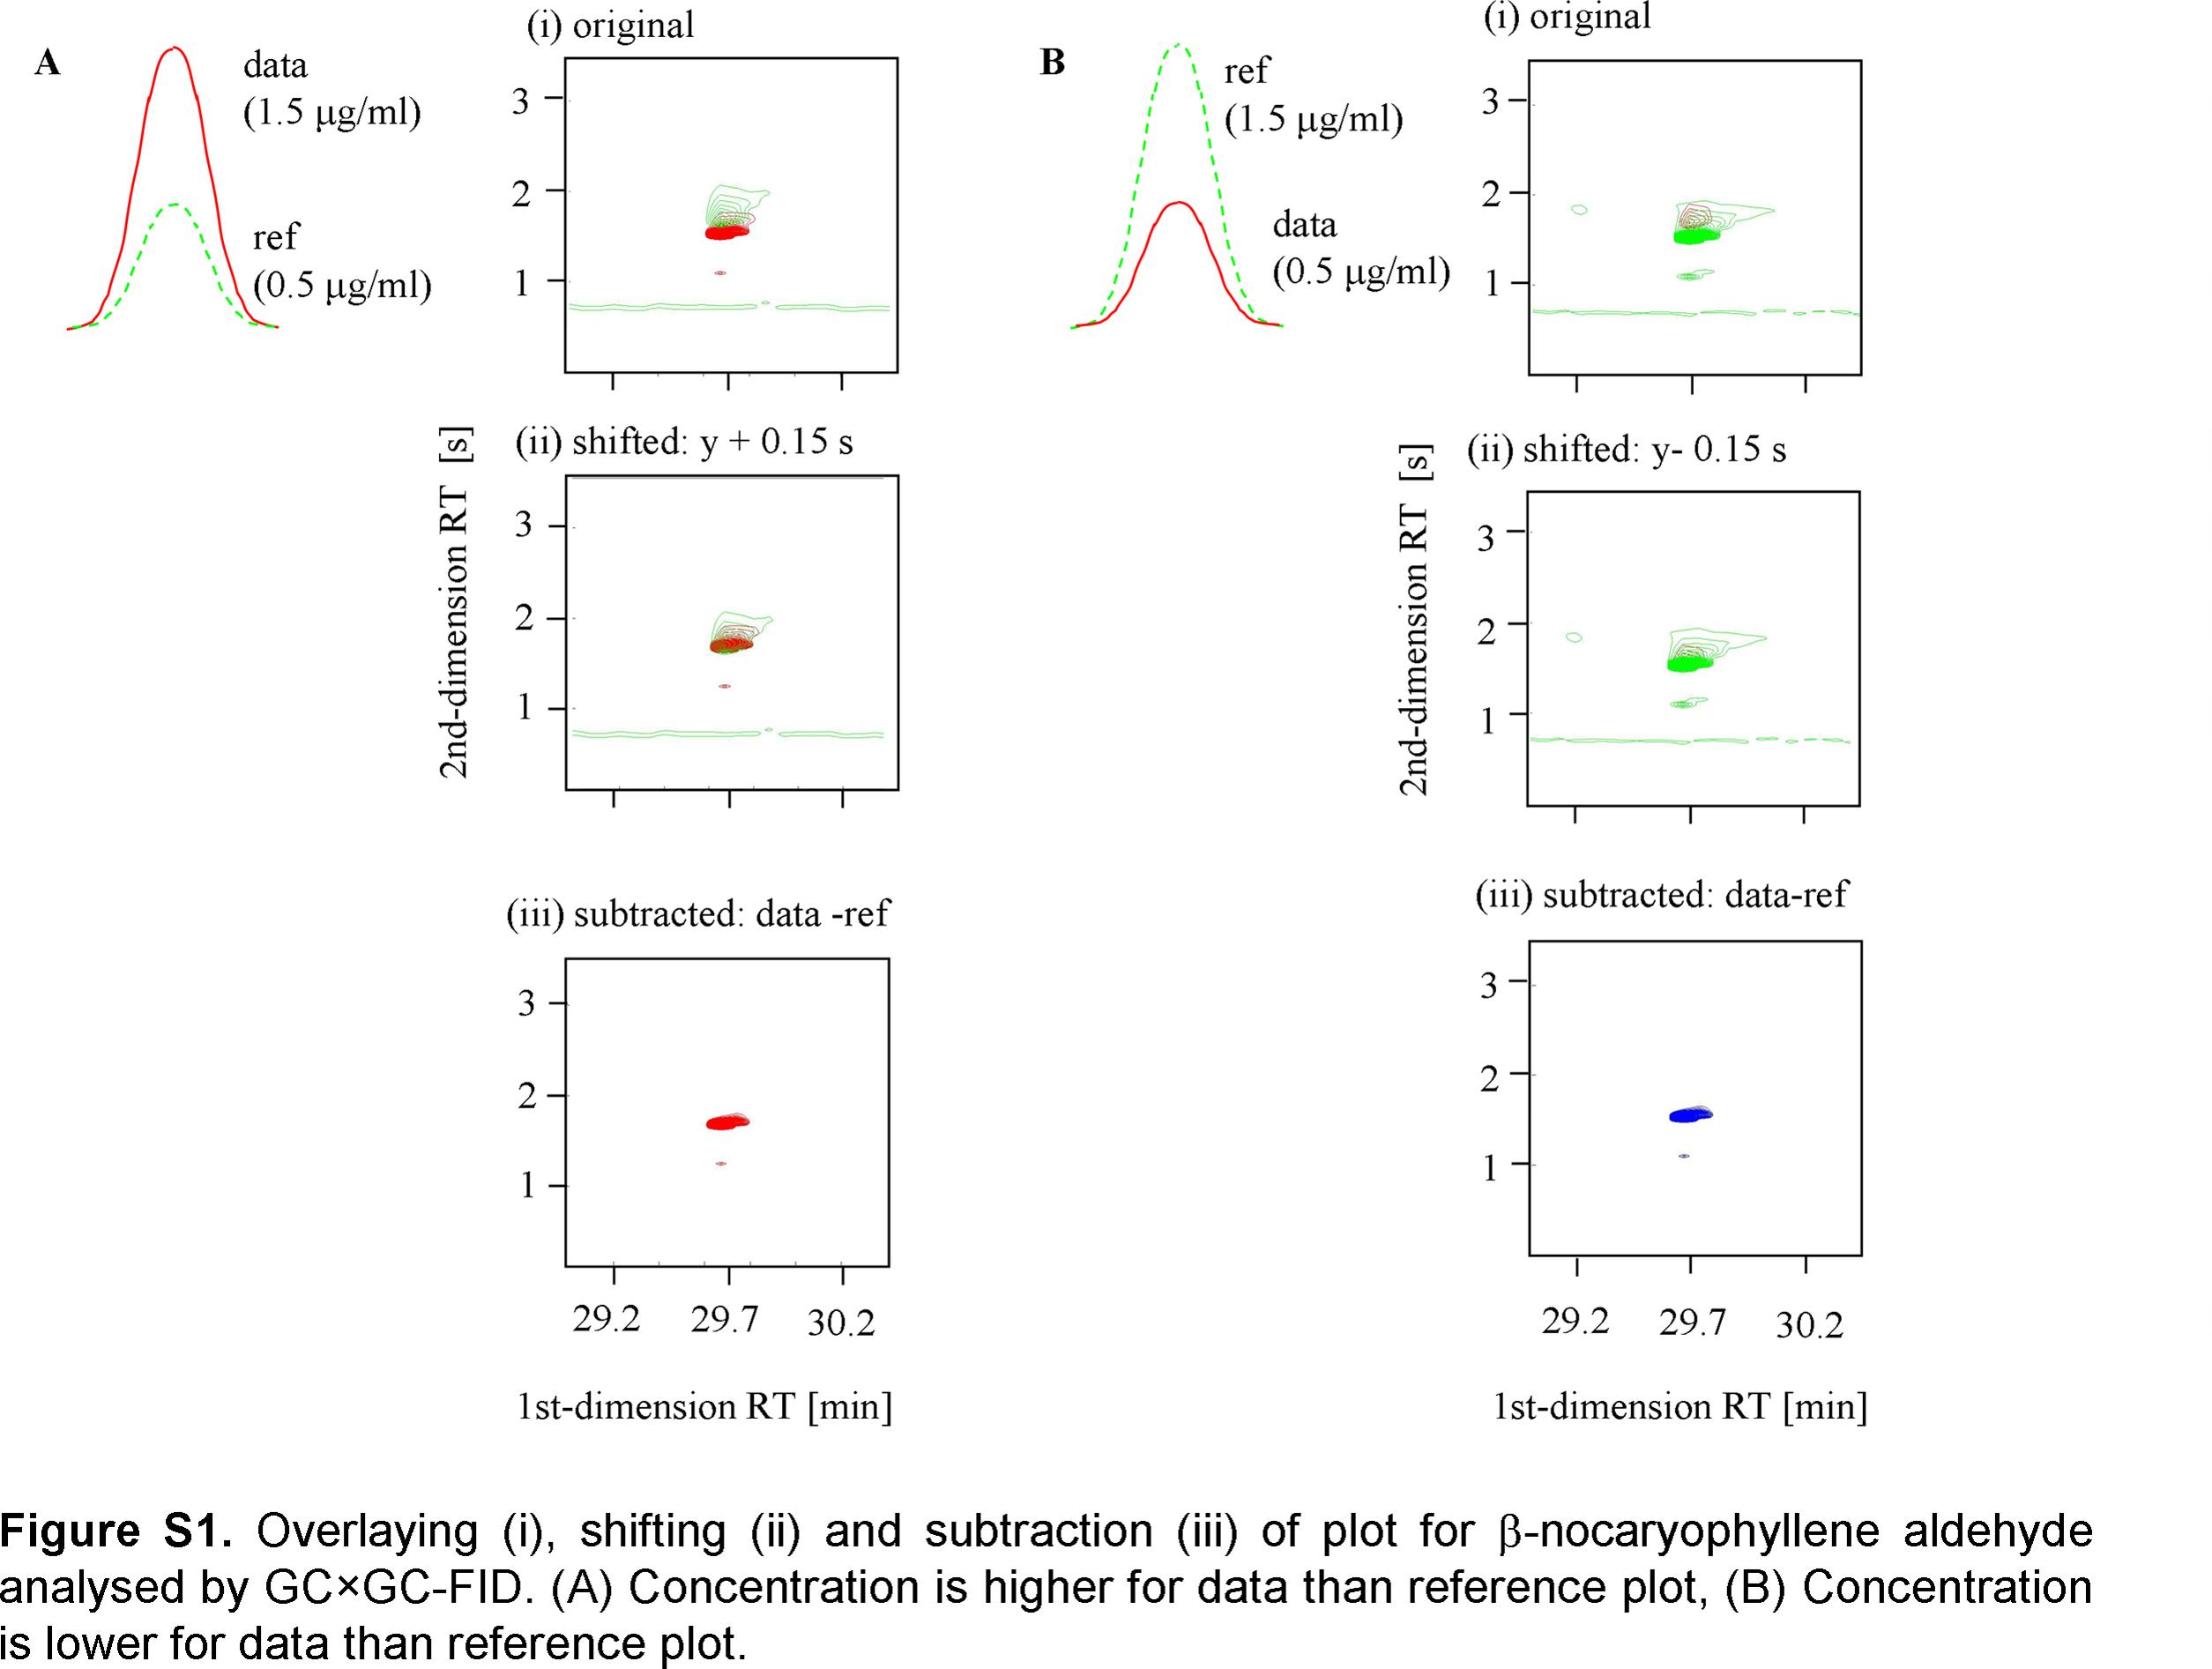 Data Analysis Programs For Comprehensive Two Dimensional Tas Mumer Gaul 3 Download Image 818kbhelp